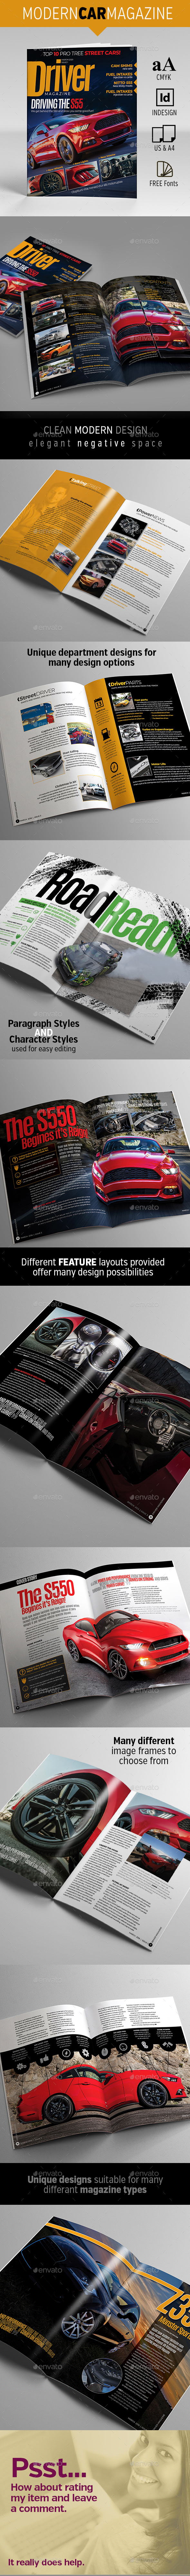 Driver Magazine - Magazines Print Templates